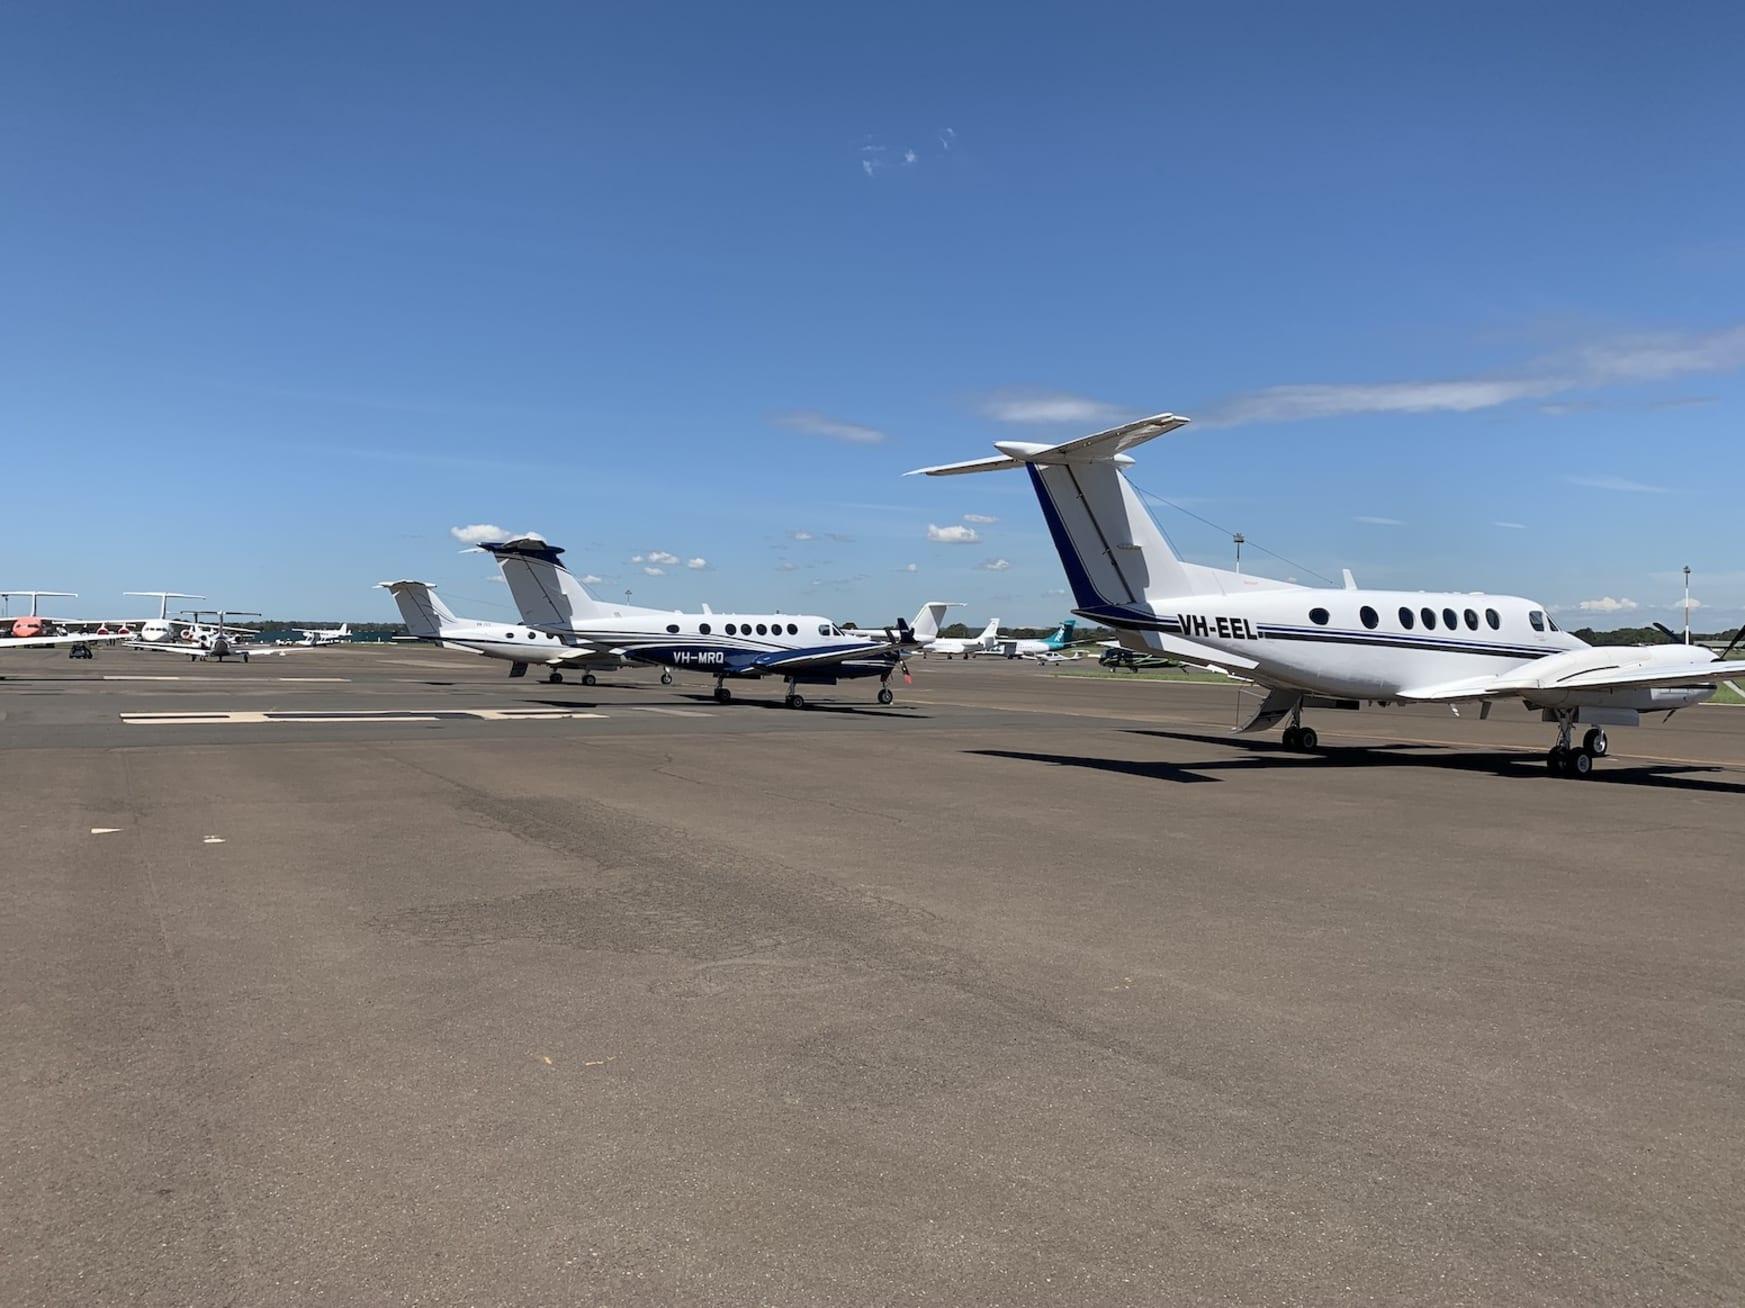 King Air freight